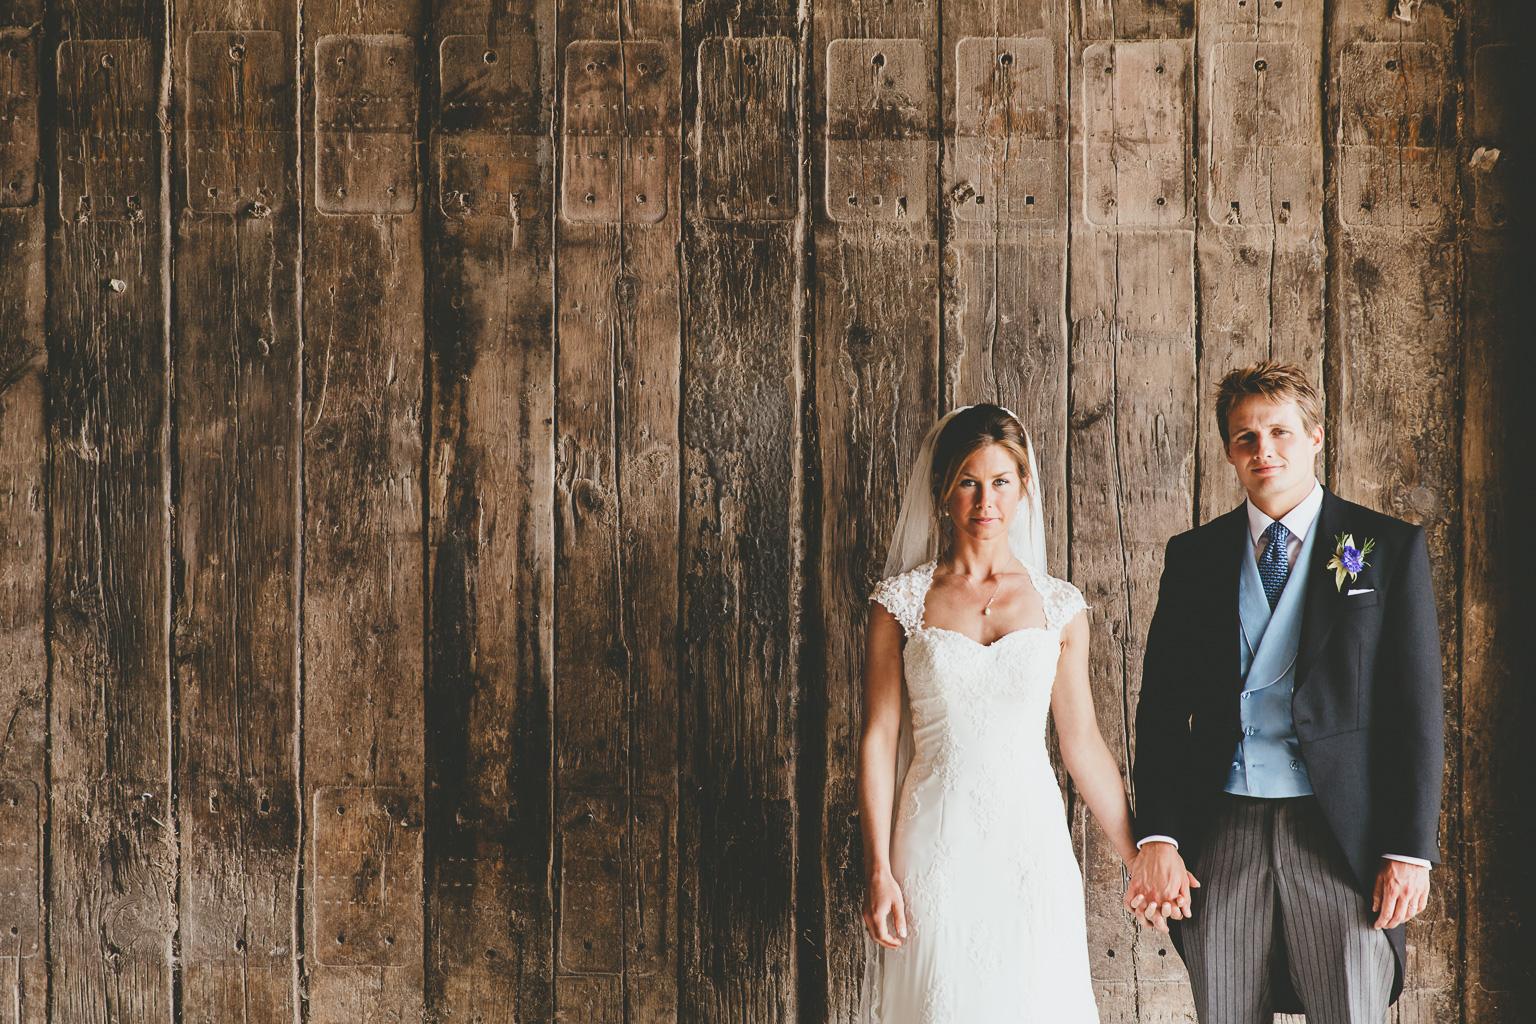 Best-wedding-photographers-Dorset-00007